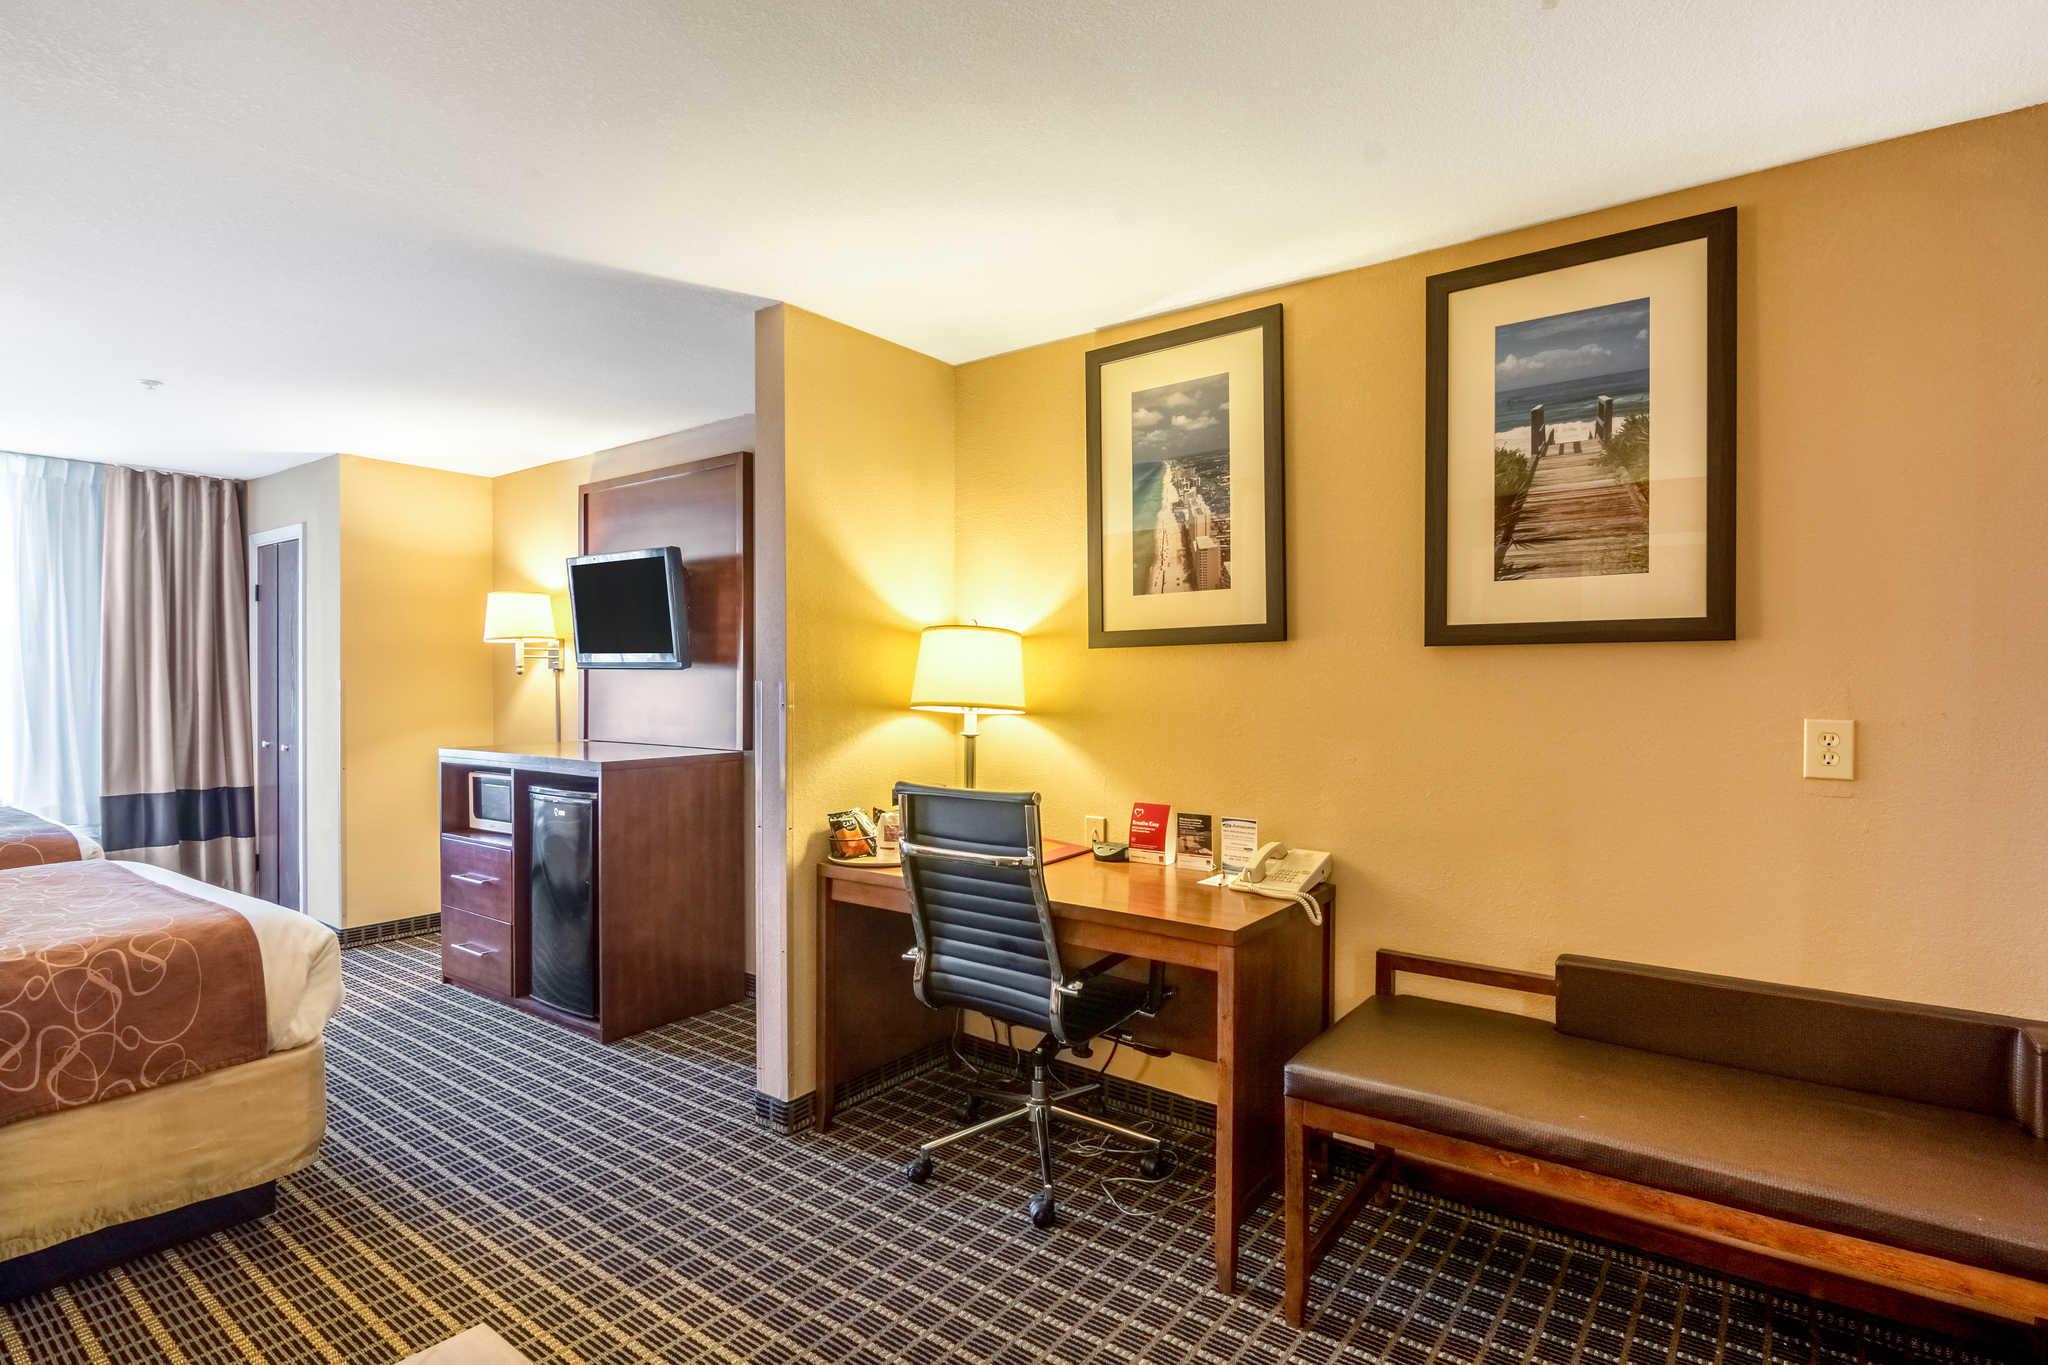 Comfort Suites image 45